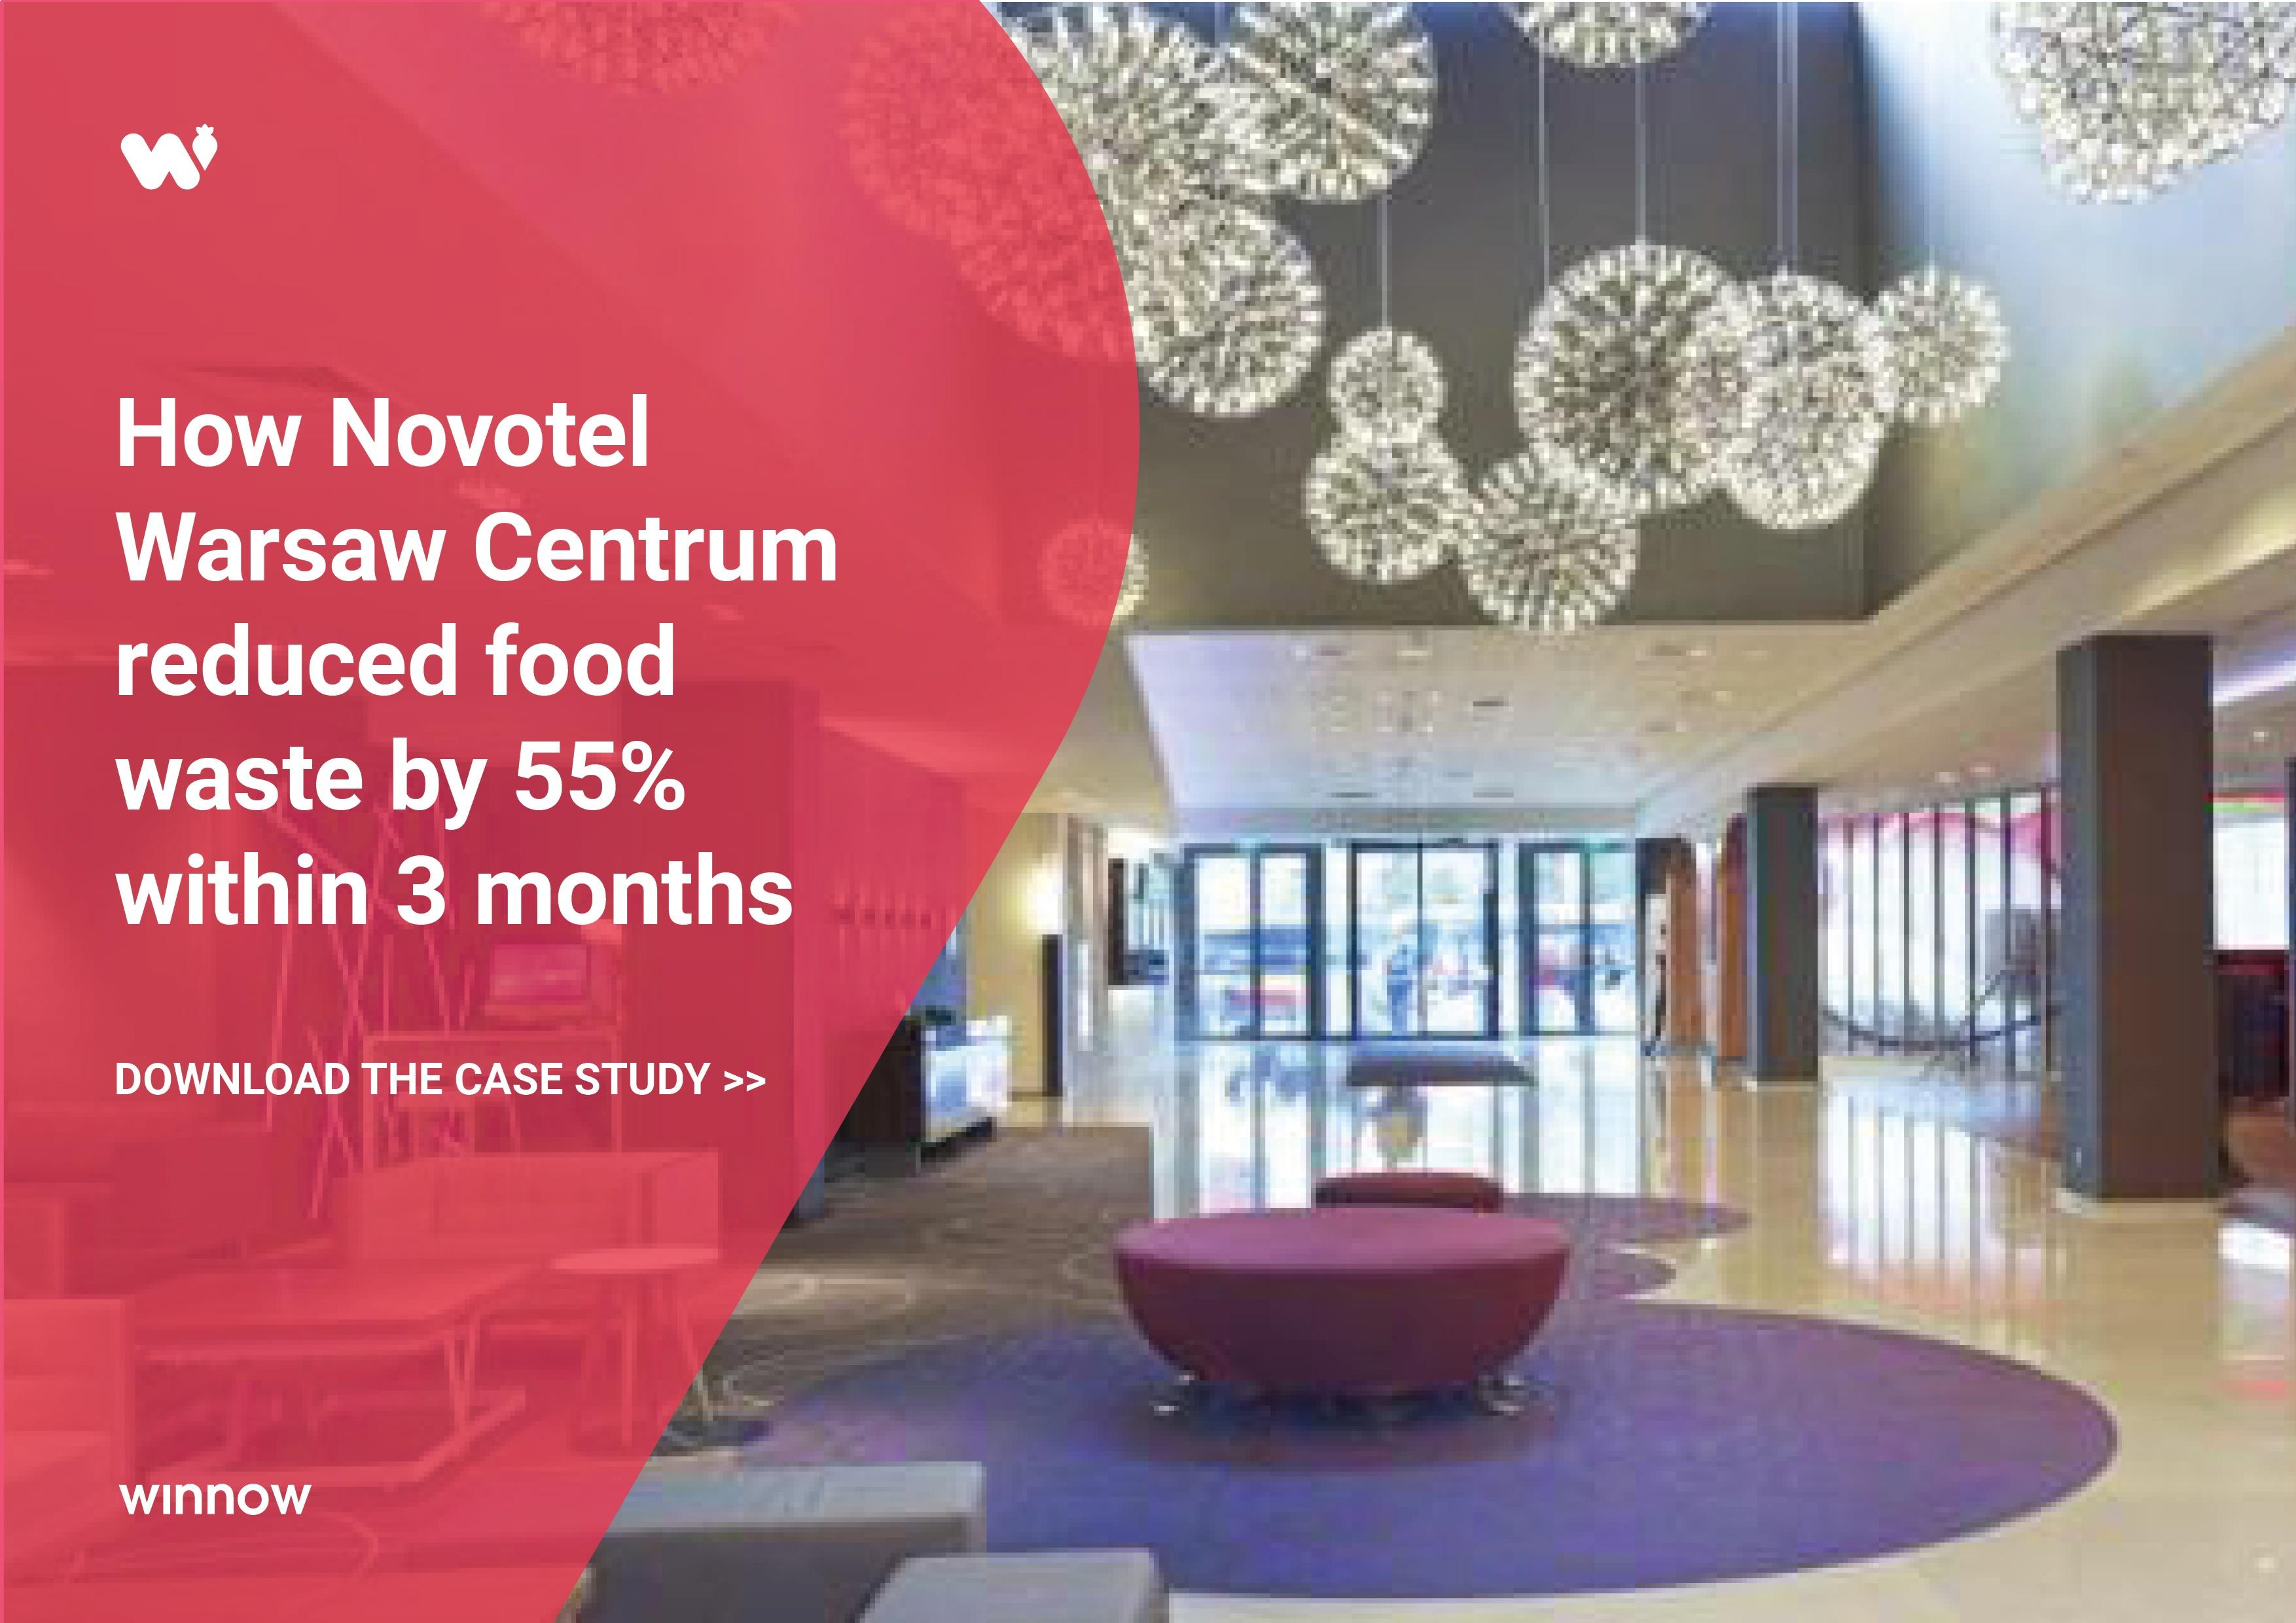 Novotel Warsaw Centrum reduced food waste by 55%